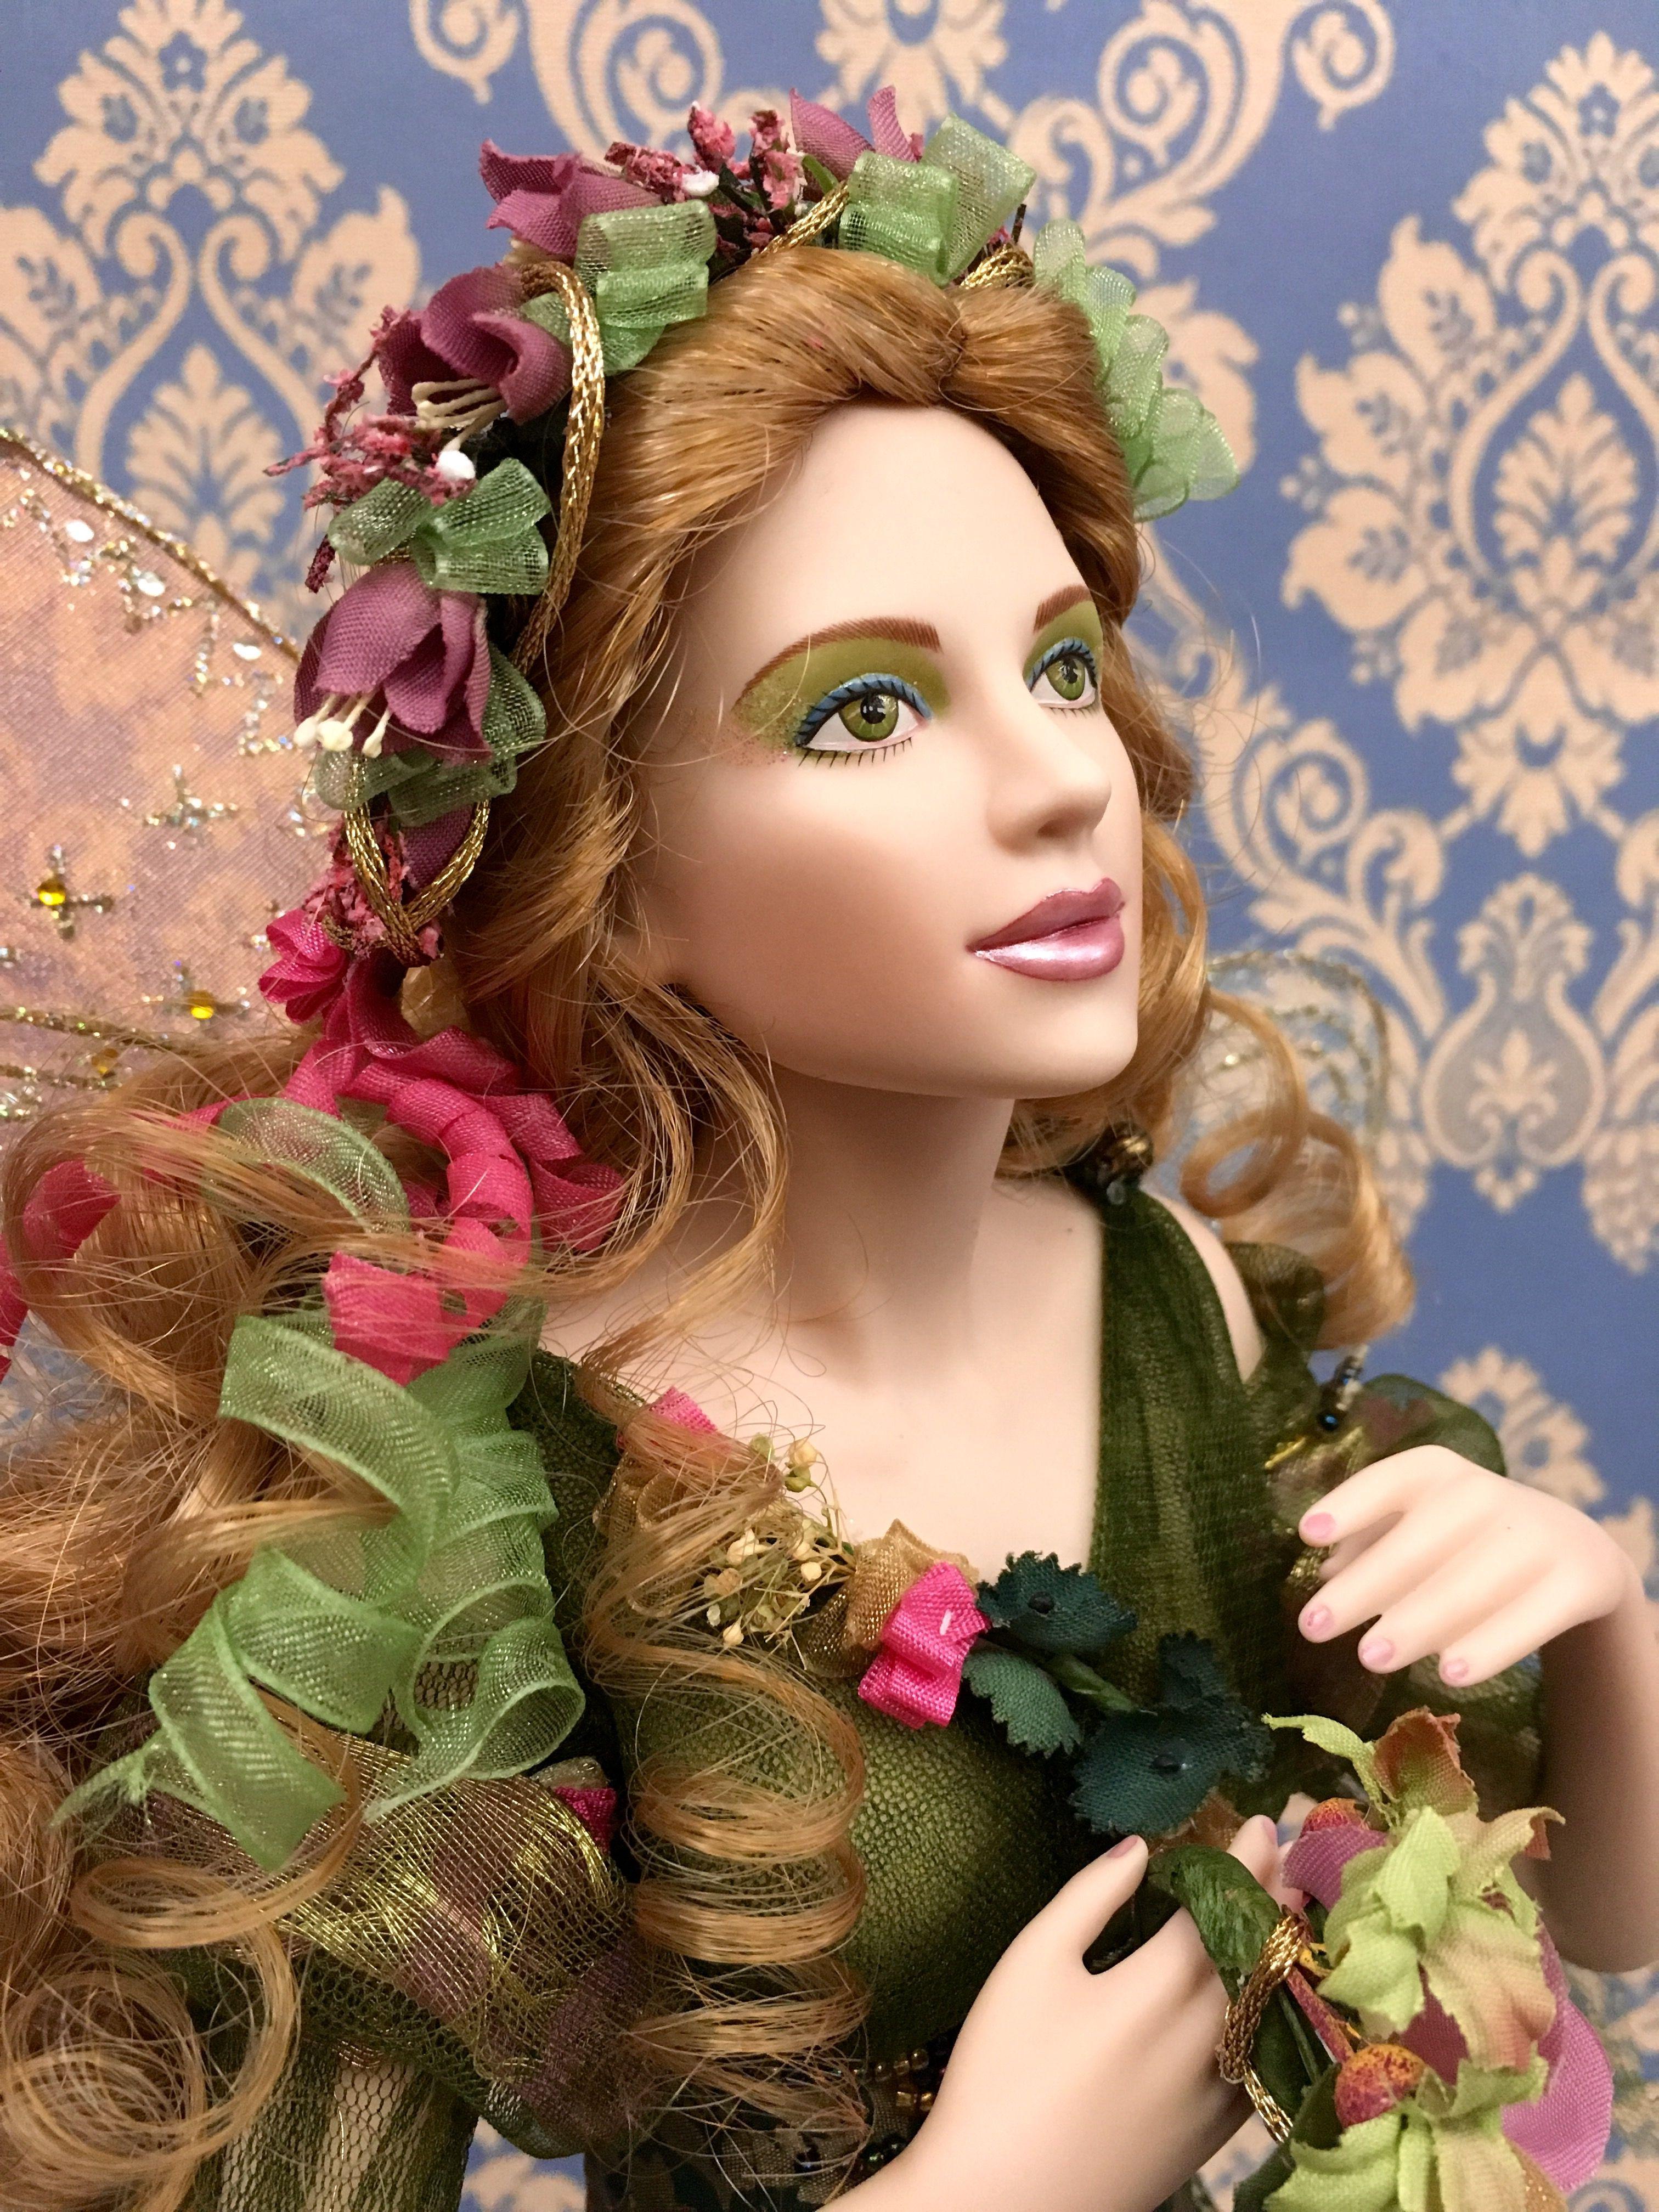 Titania, Fairy Queen Porcelain Collector Doll The